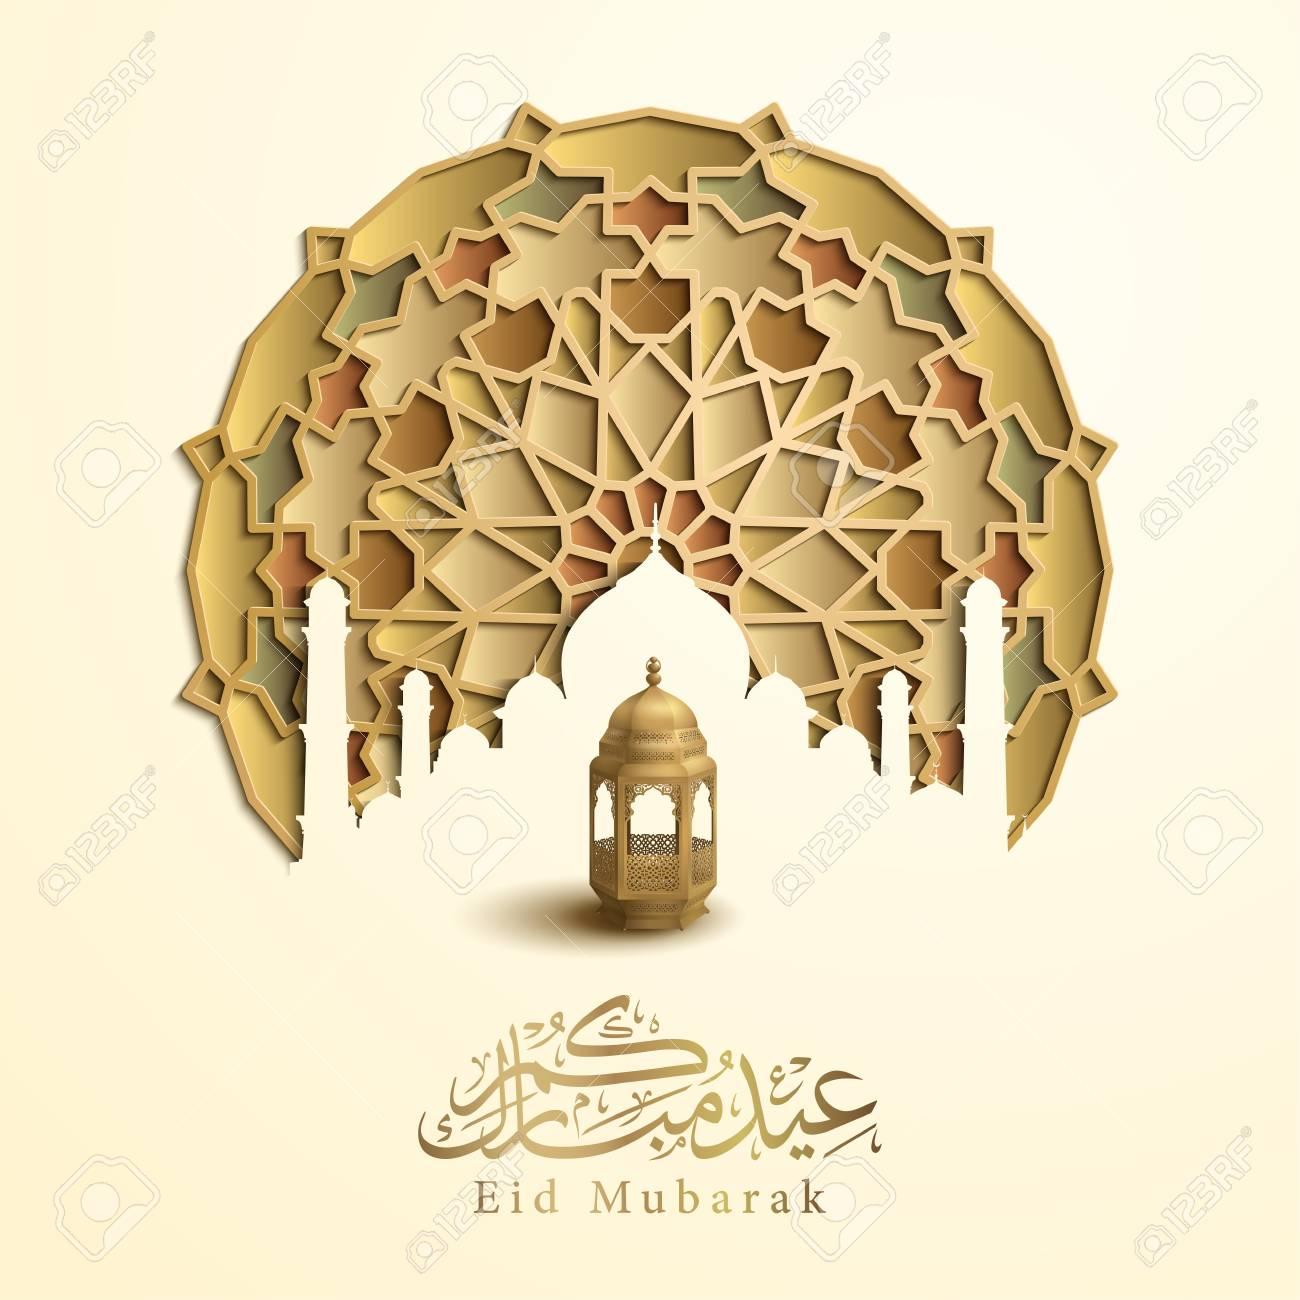 Eid Mubarak islamic greeting with arabic lantern and calligraphy